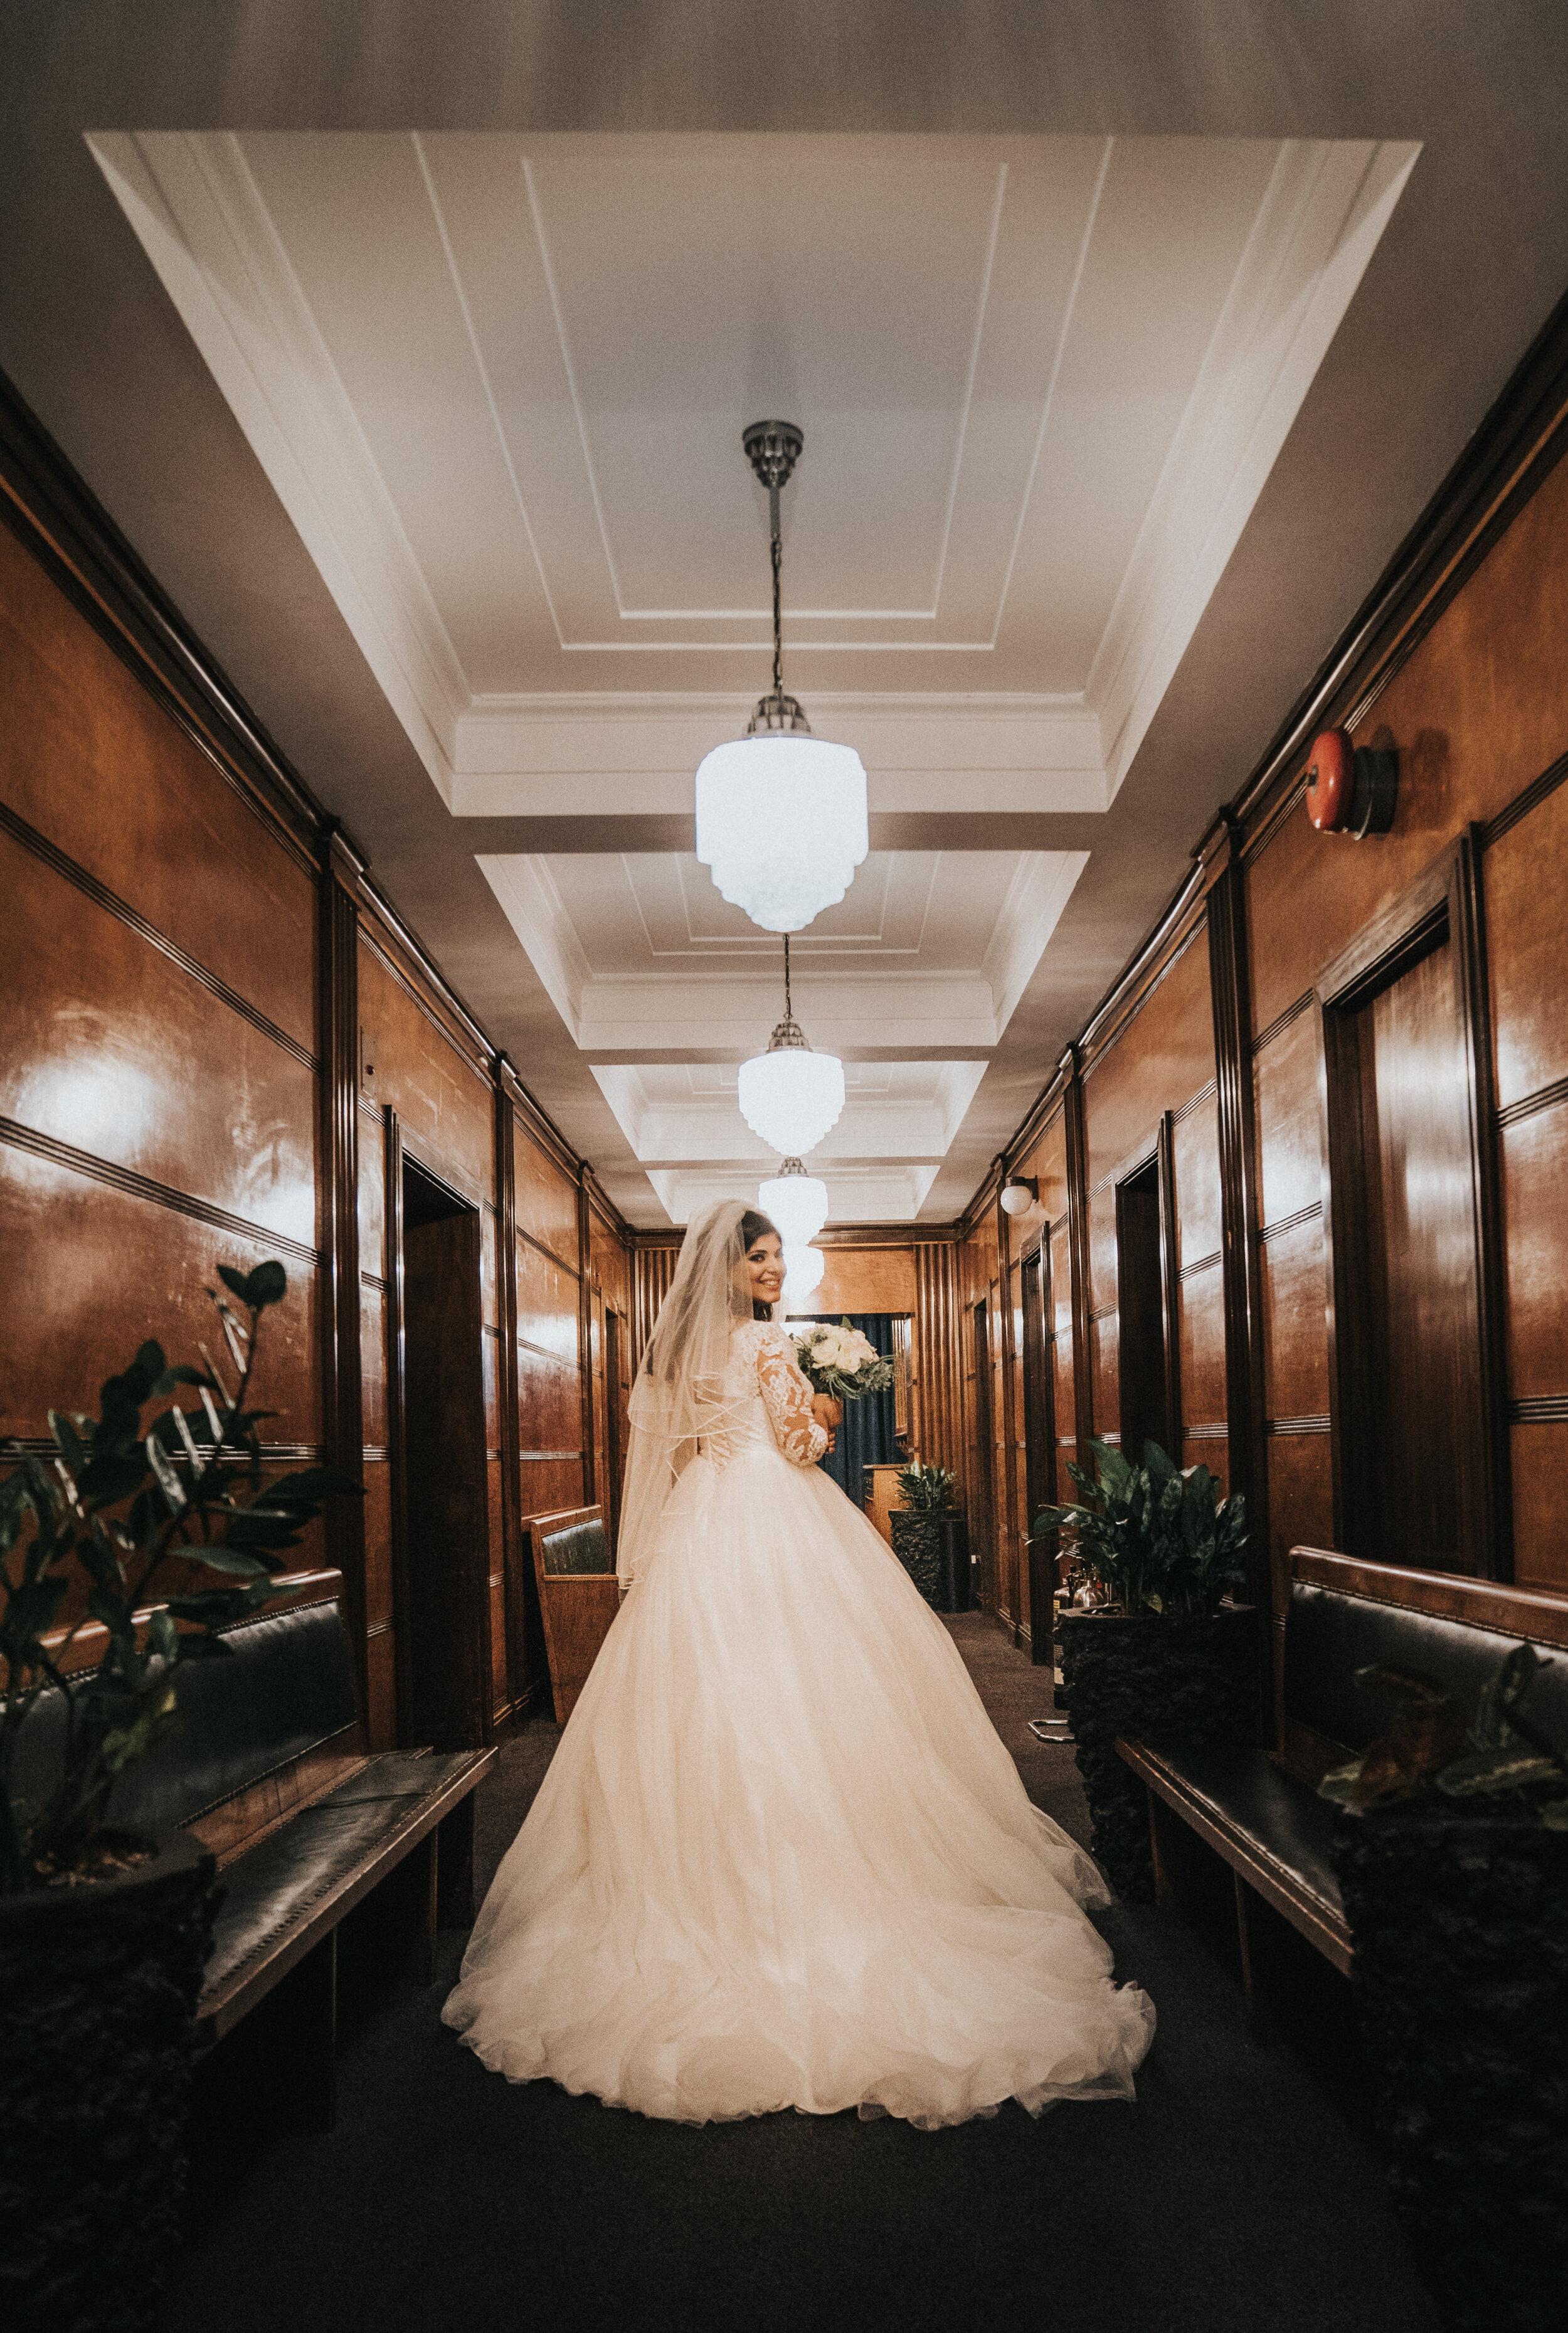 east-london-wedding-photographer-videographer-patriot-square-apartments-27